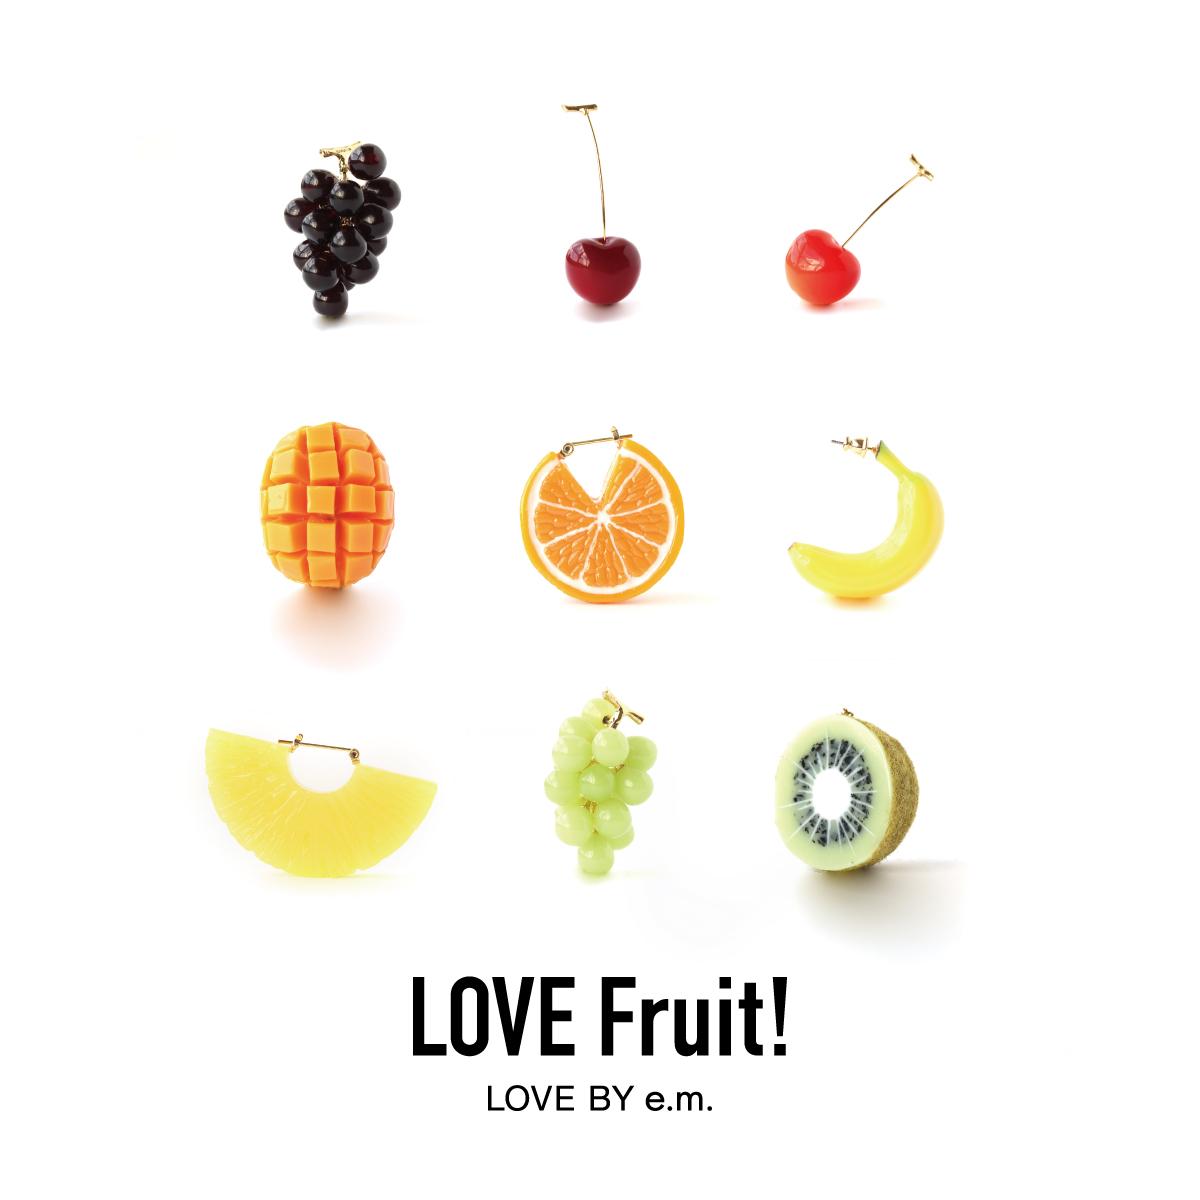 love by e.m._LOVE Fruit!